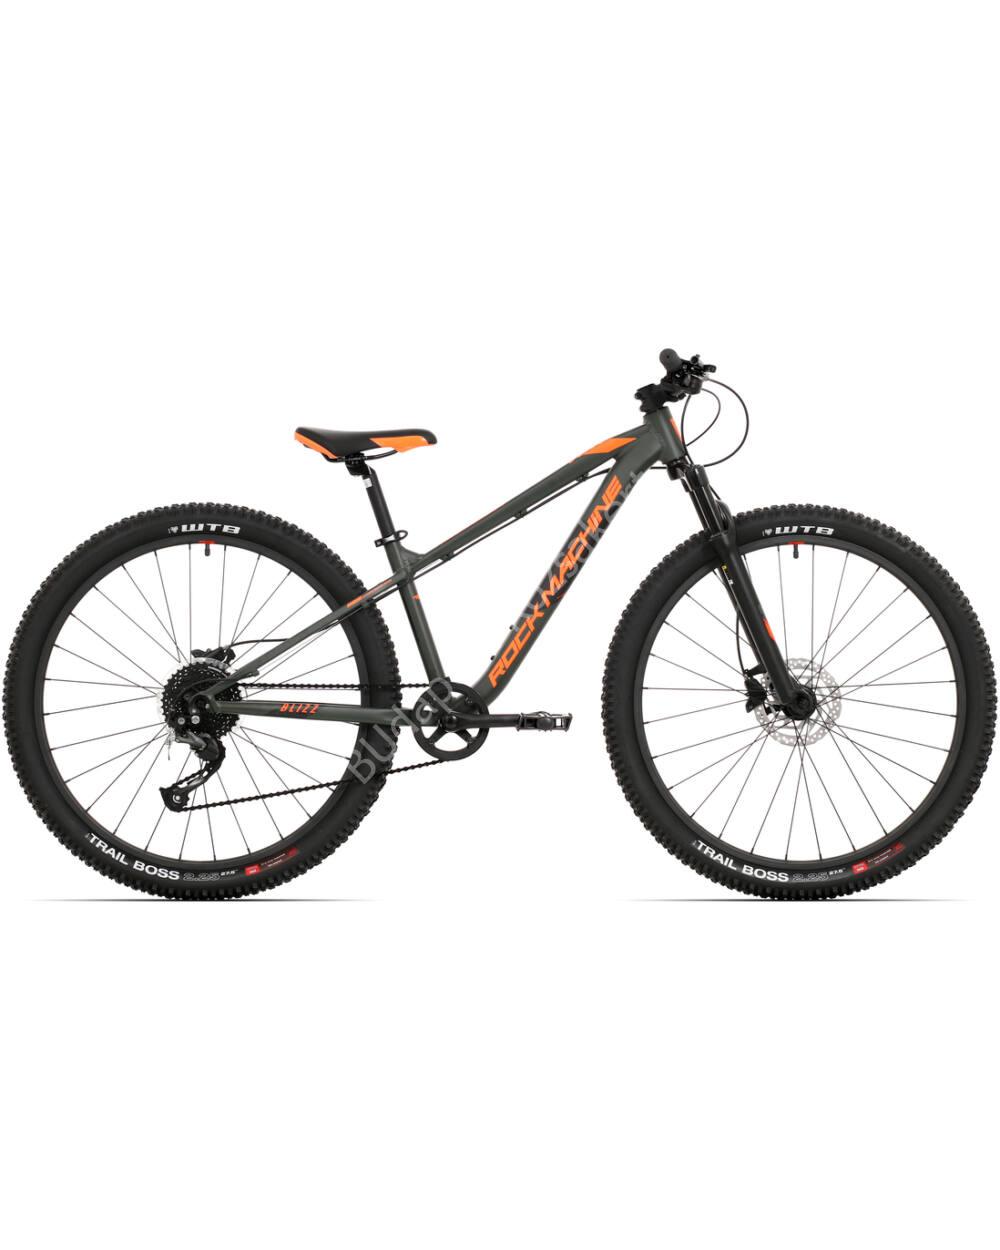 Rock Machine Blizz 27,5 MD mat khaki orange kerékpár, 135-155 cm,  12.9 kg